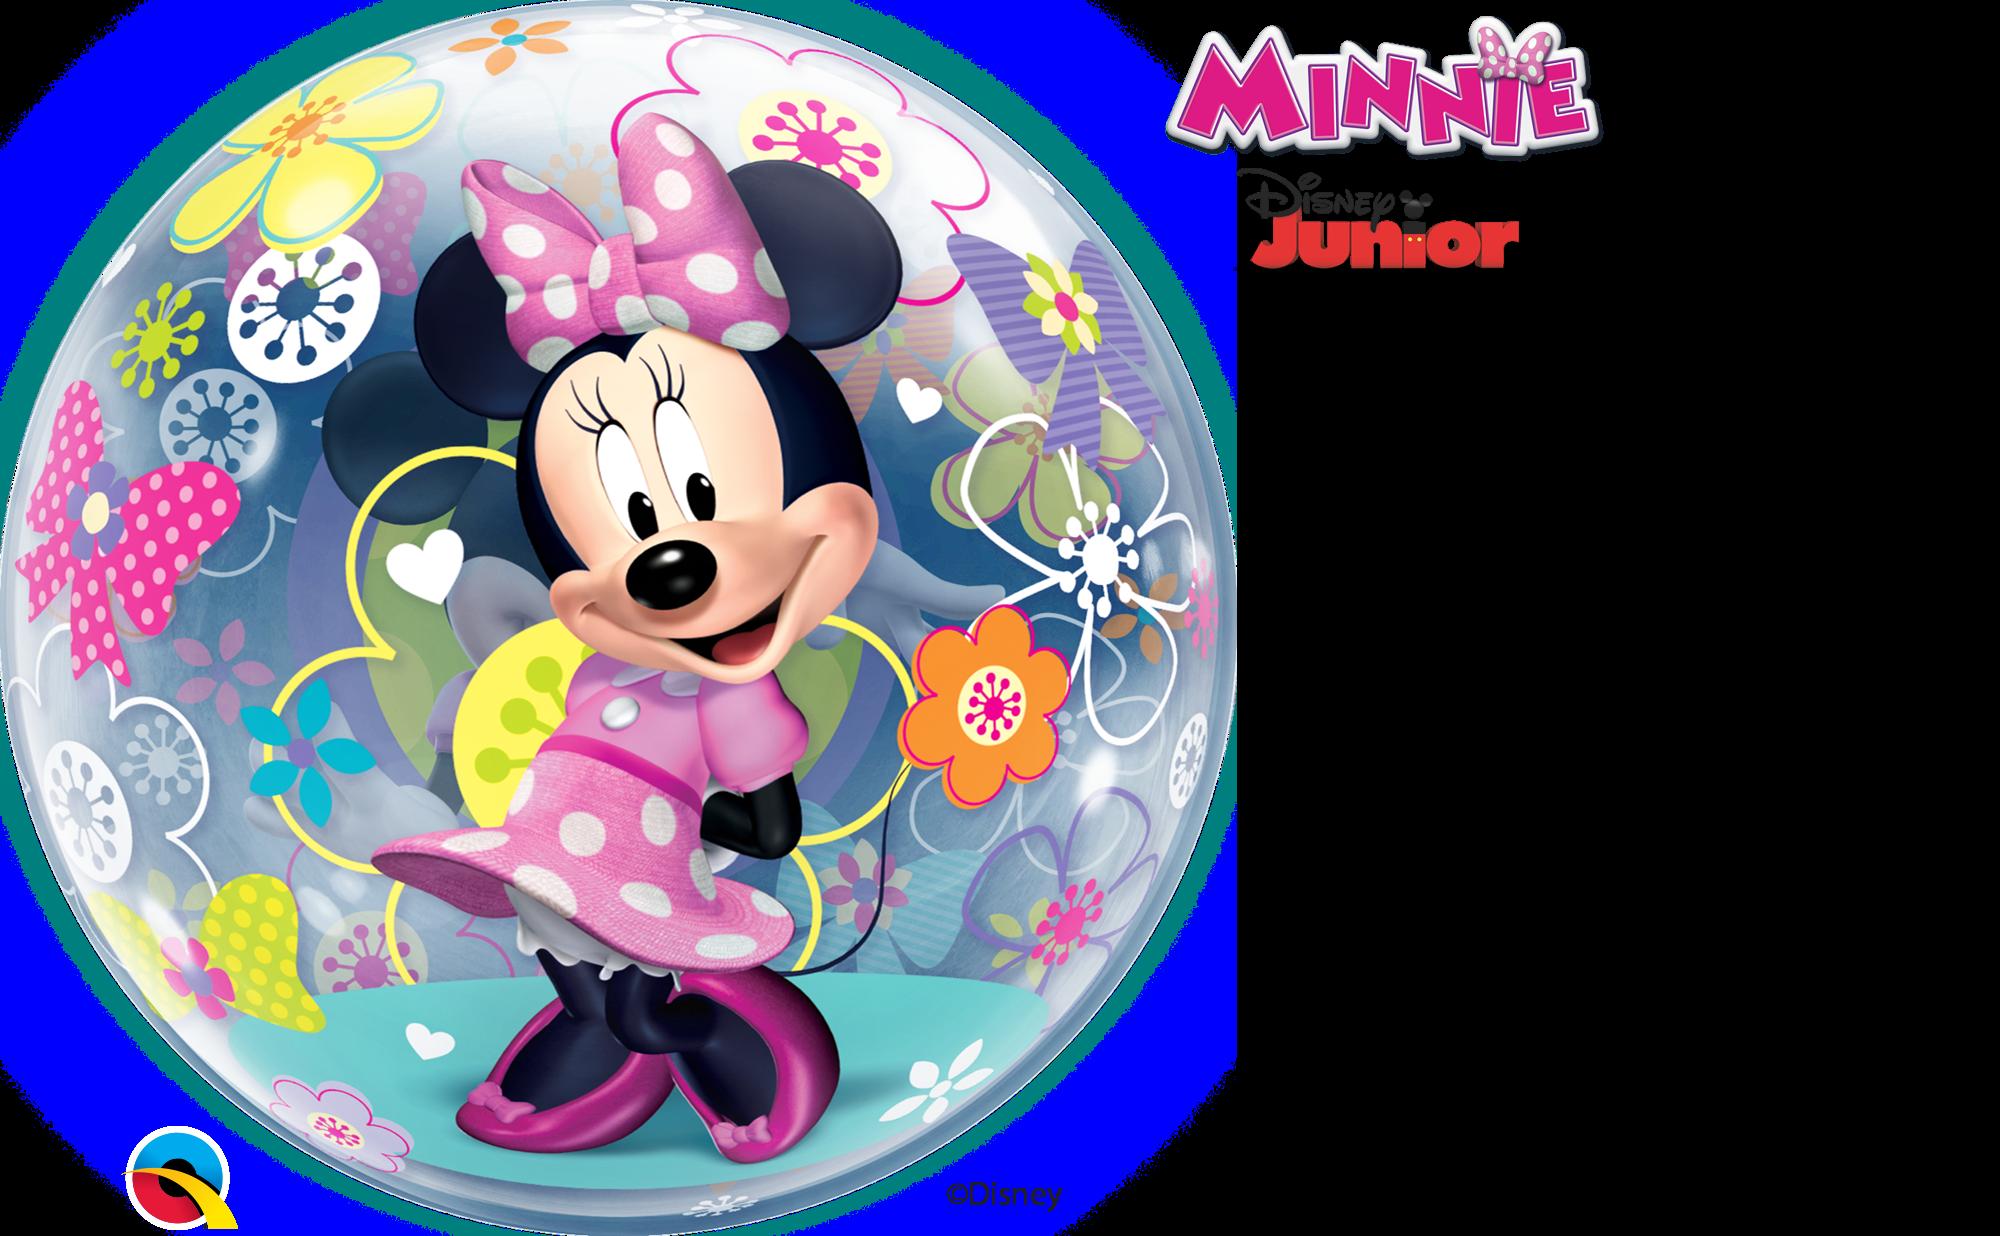 Disney bow tique balloon. Eyelashes clipart minnie mouse